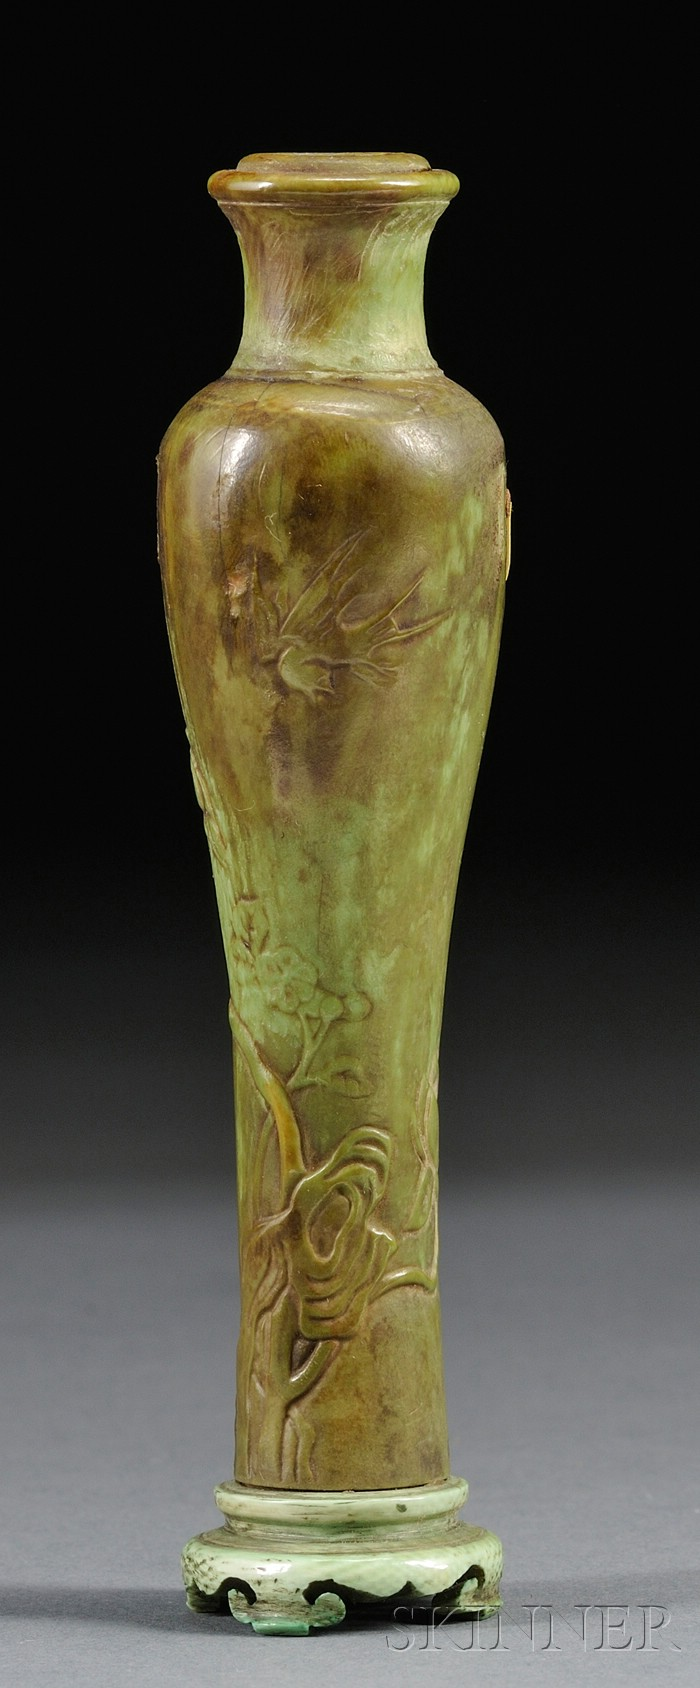 Ivory Incense Vase